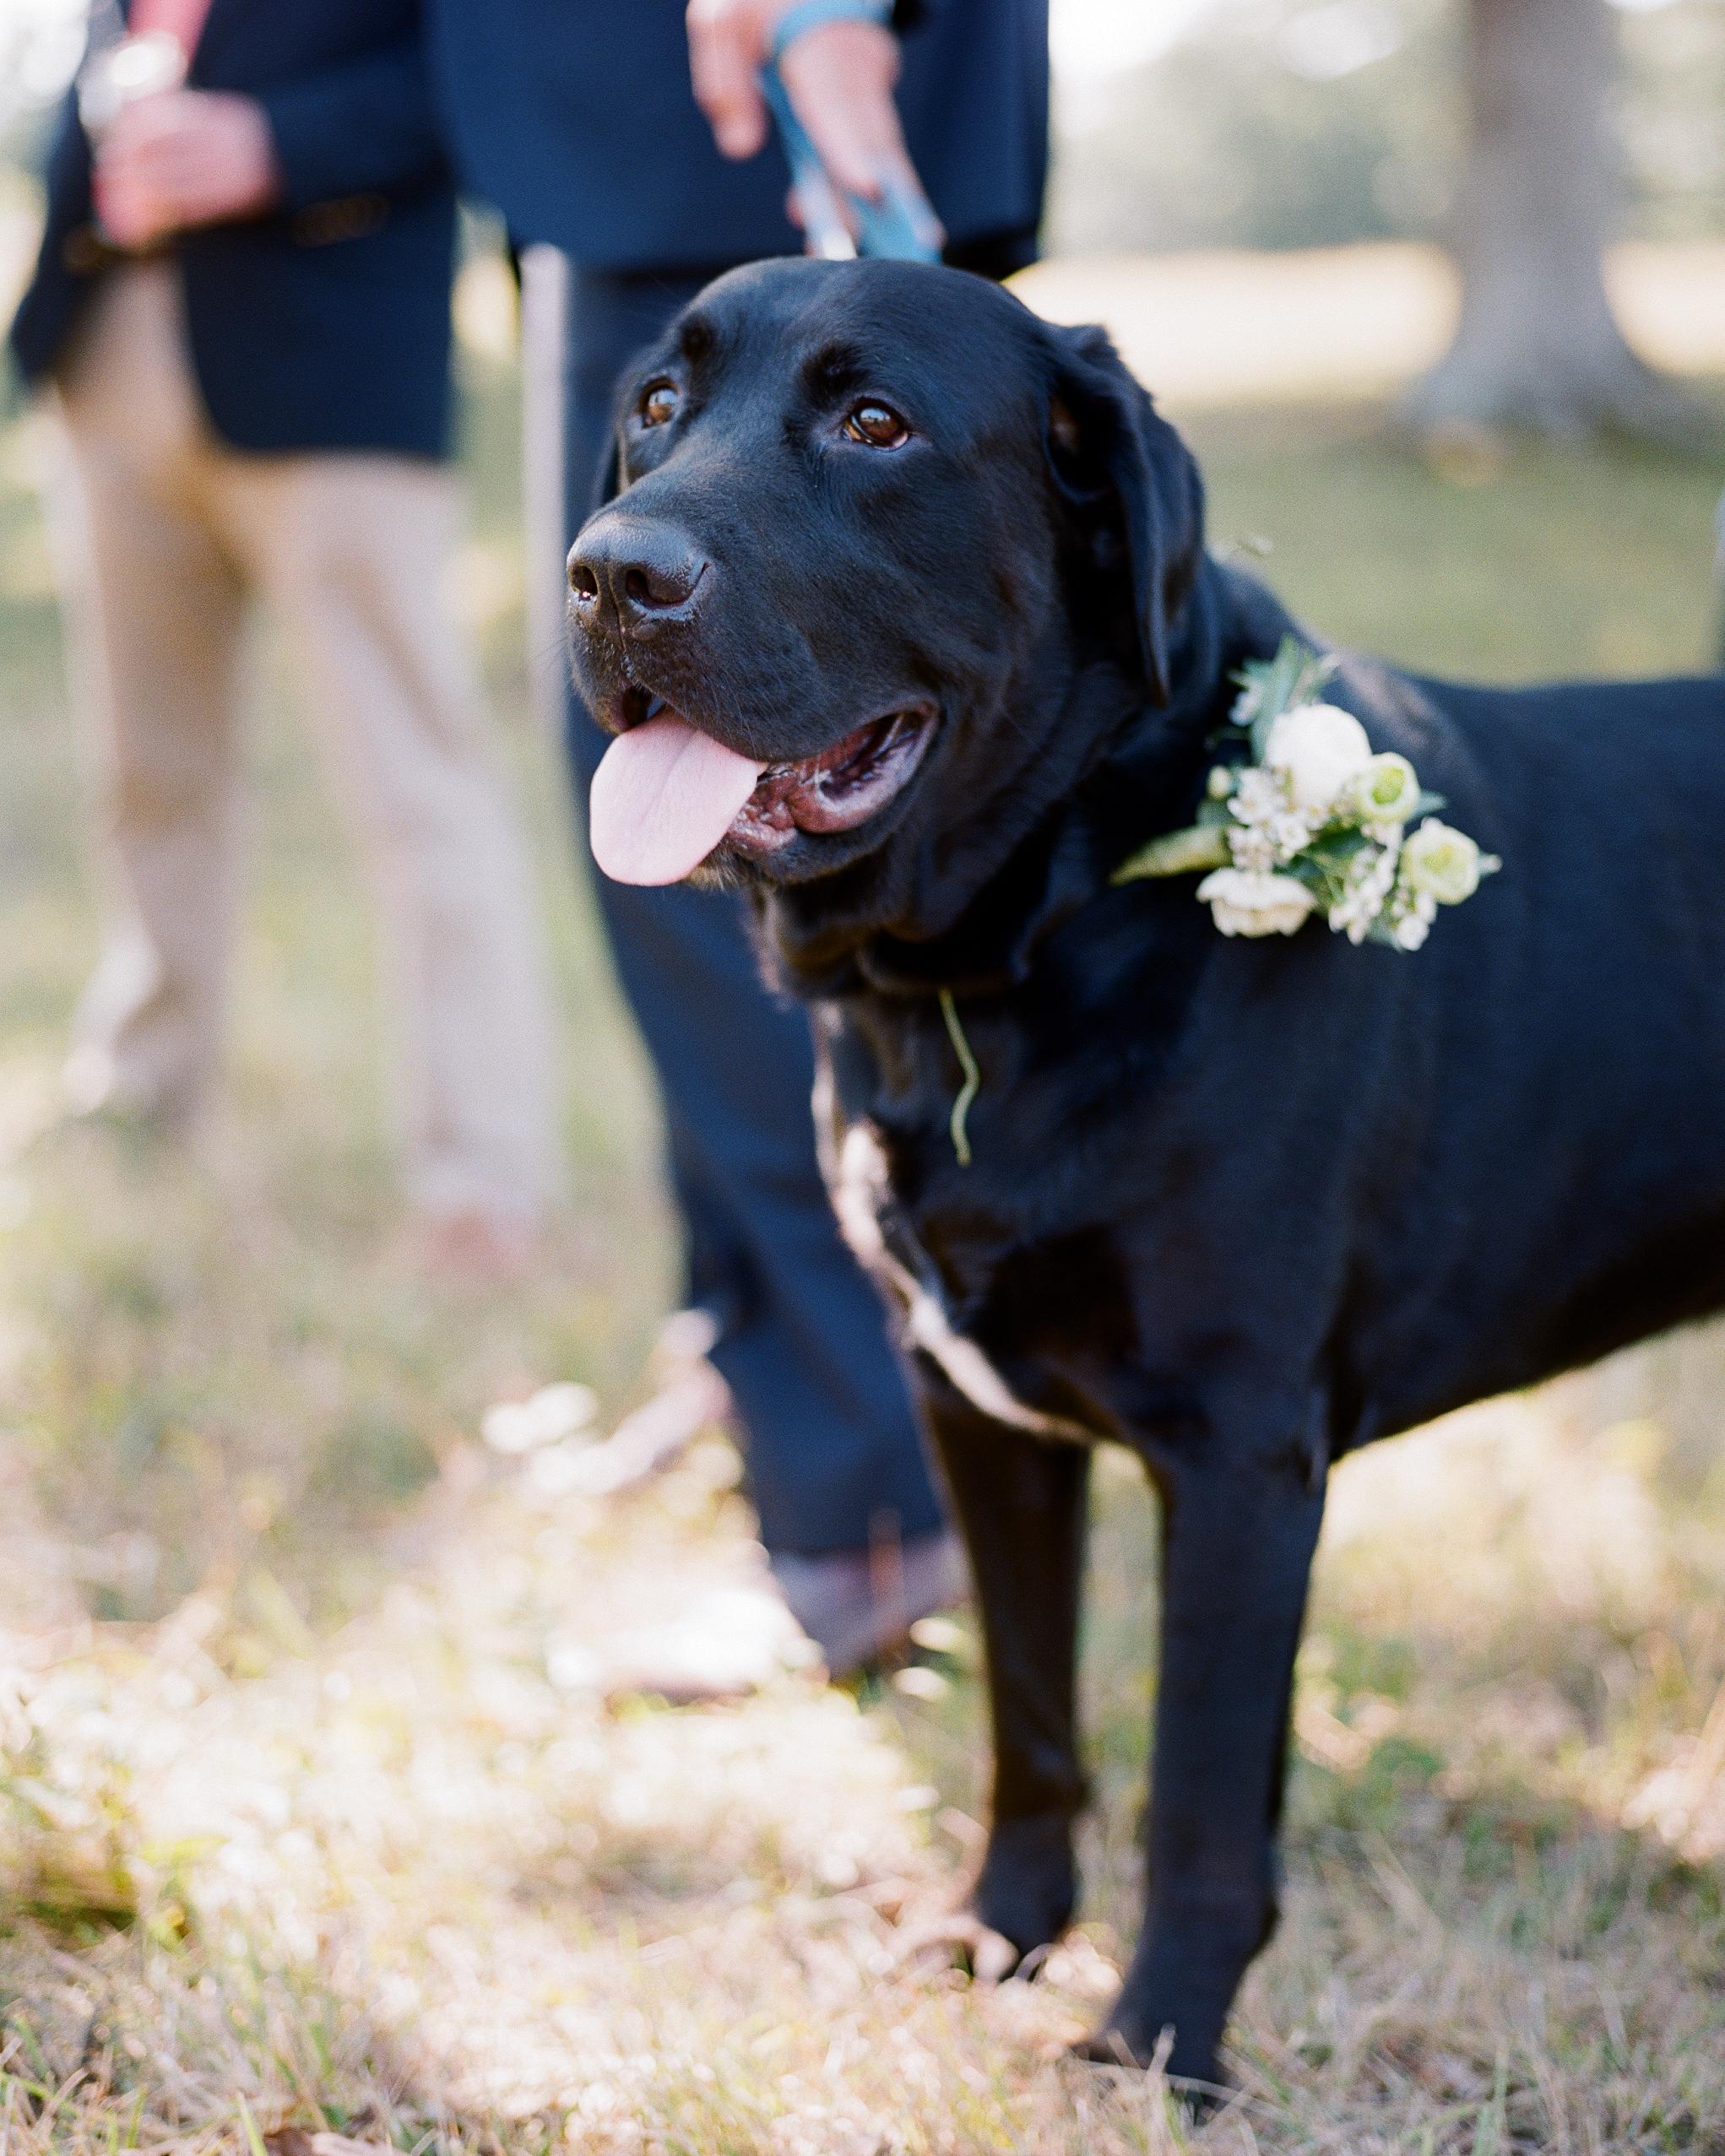 jocelyn-graham-wedding-dog-0598-s111847-0315.jpg